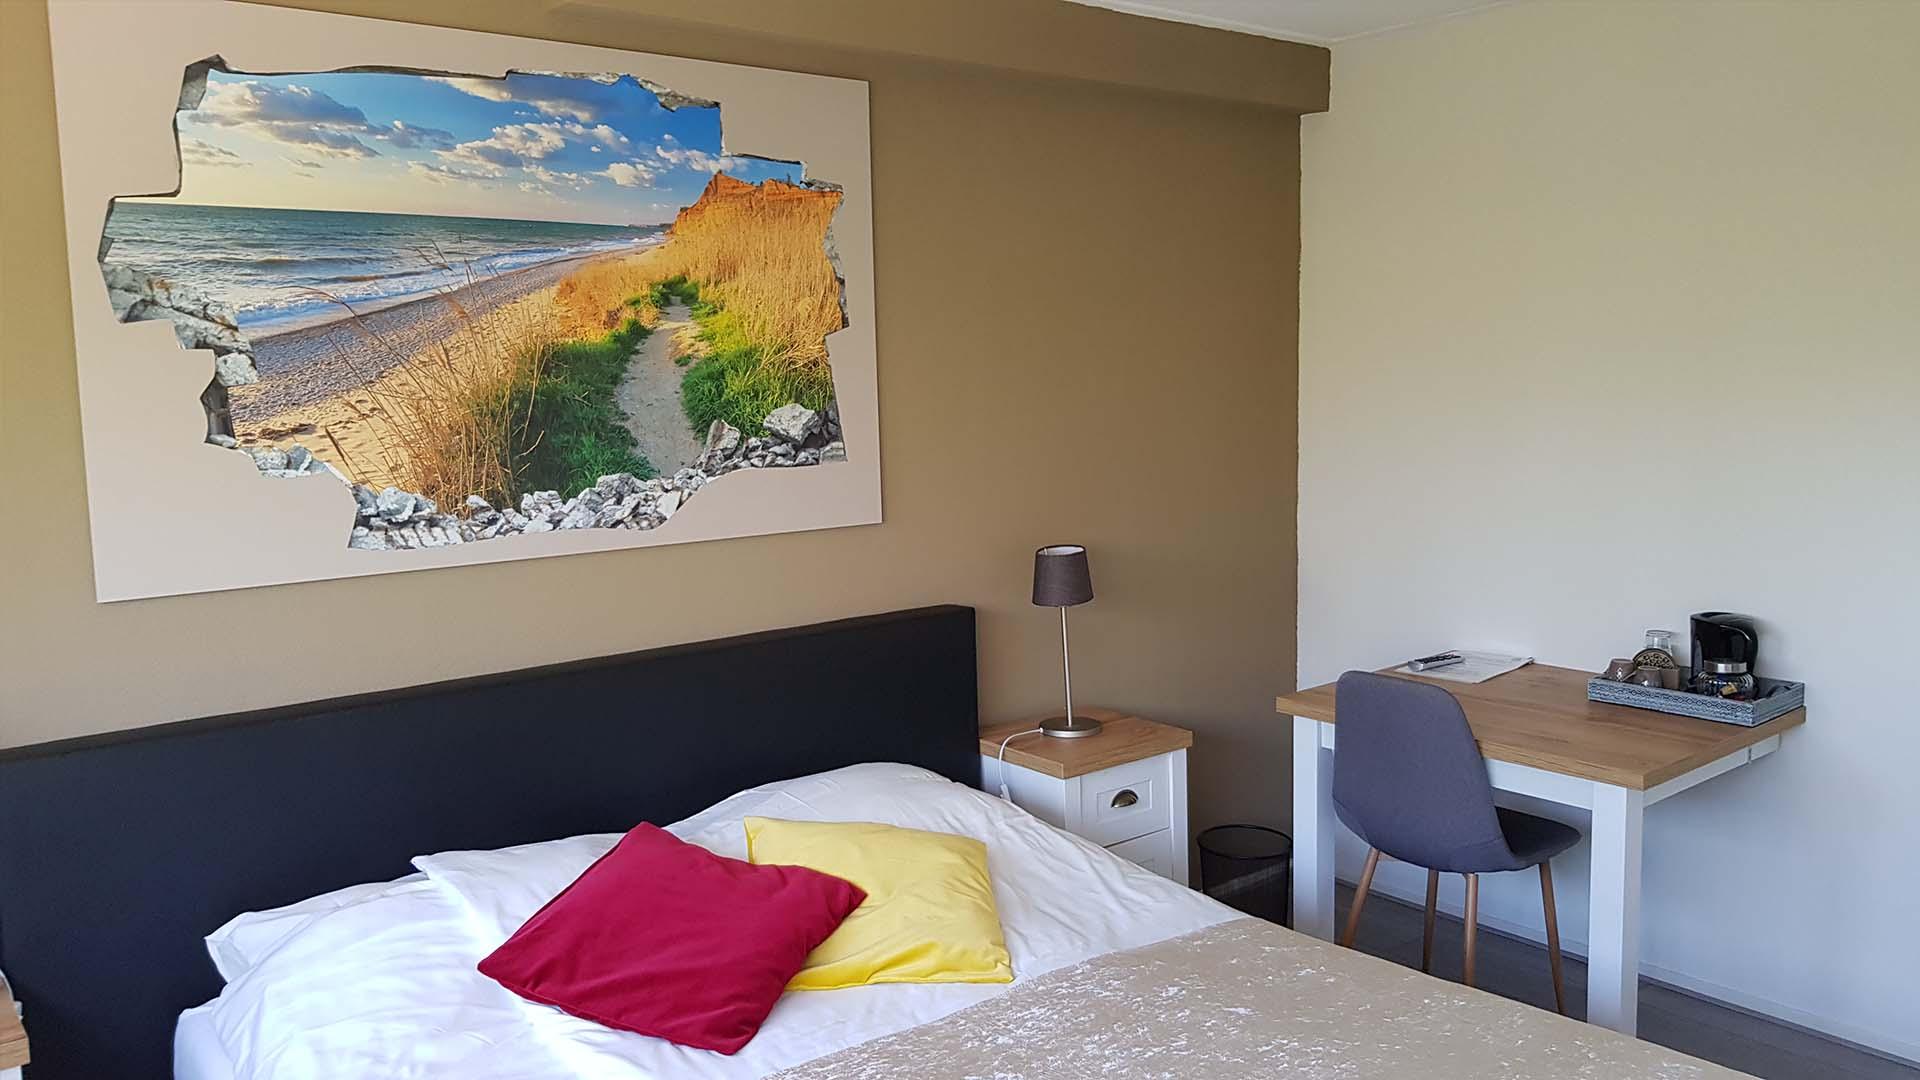 kamer 3 bureau B&B Plompetorenzicht Burg-Haamstede Zeeland